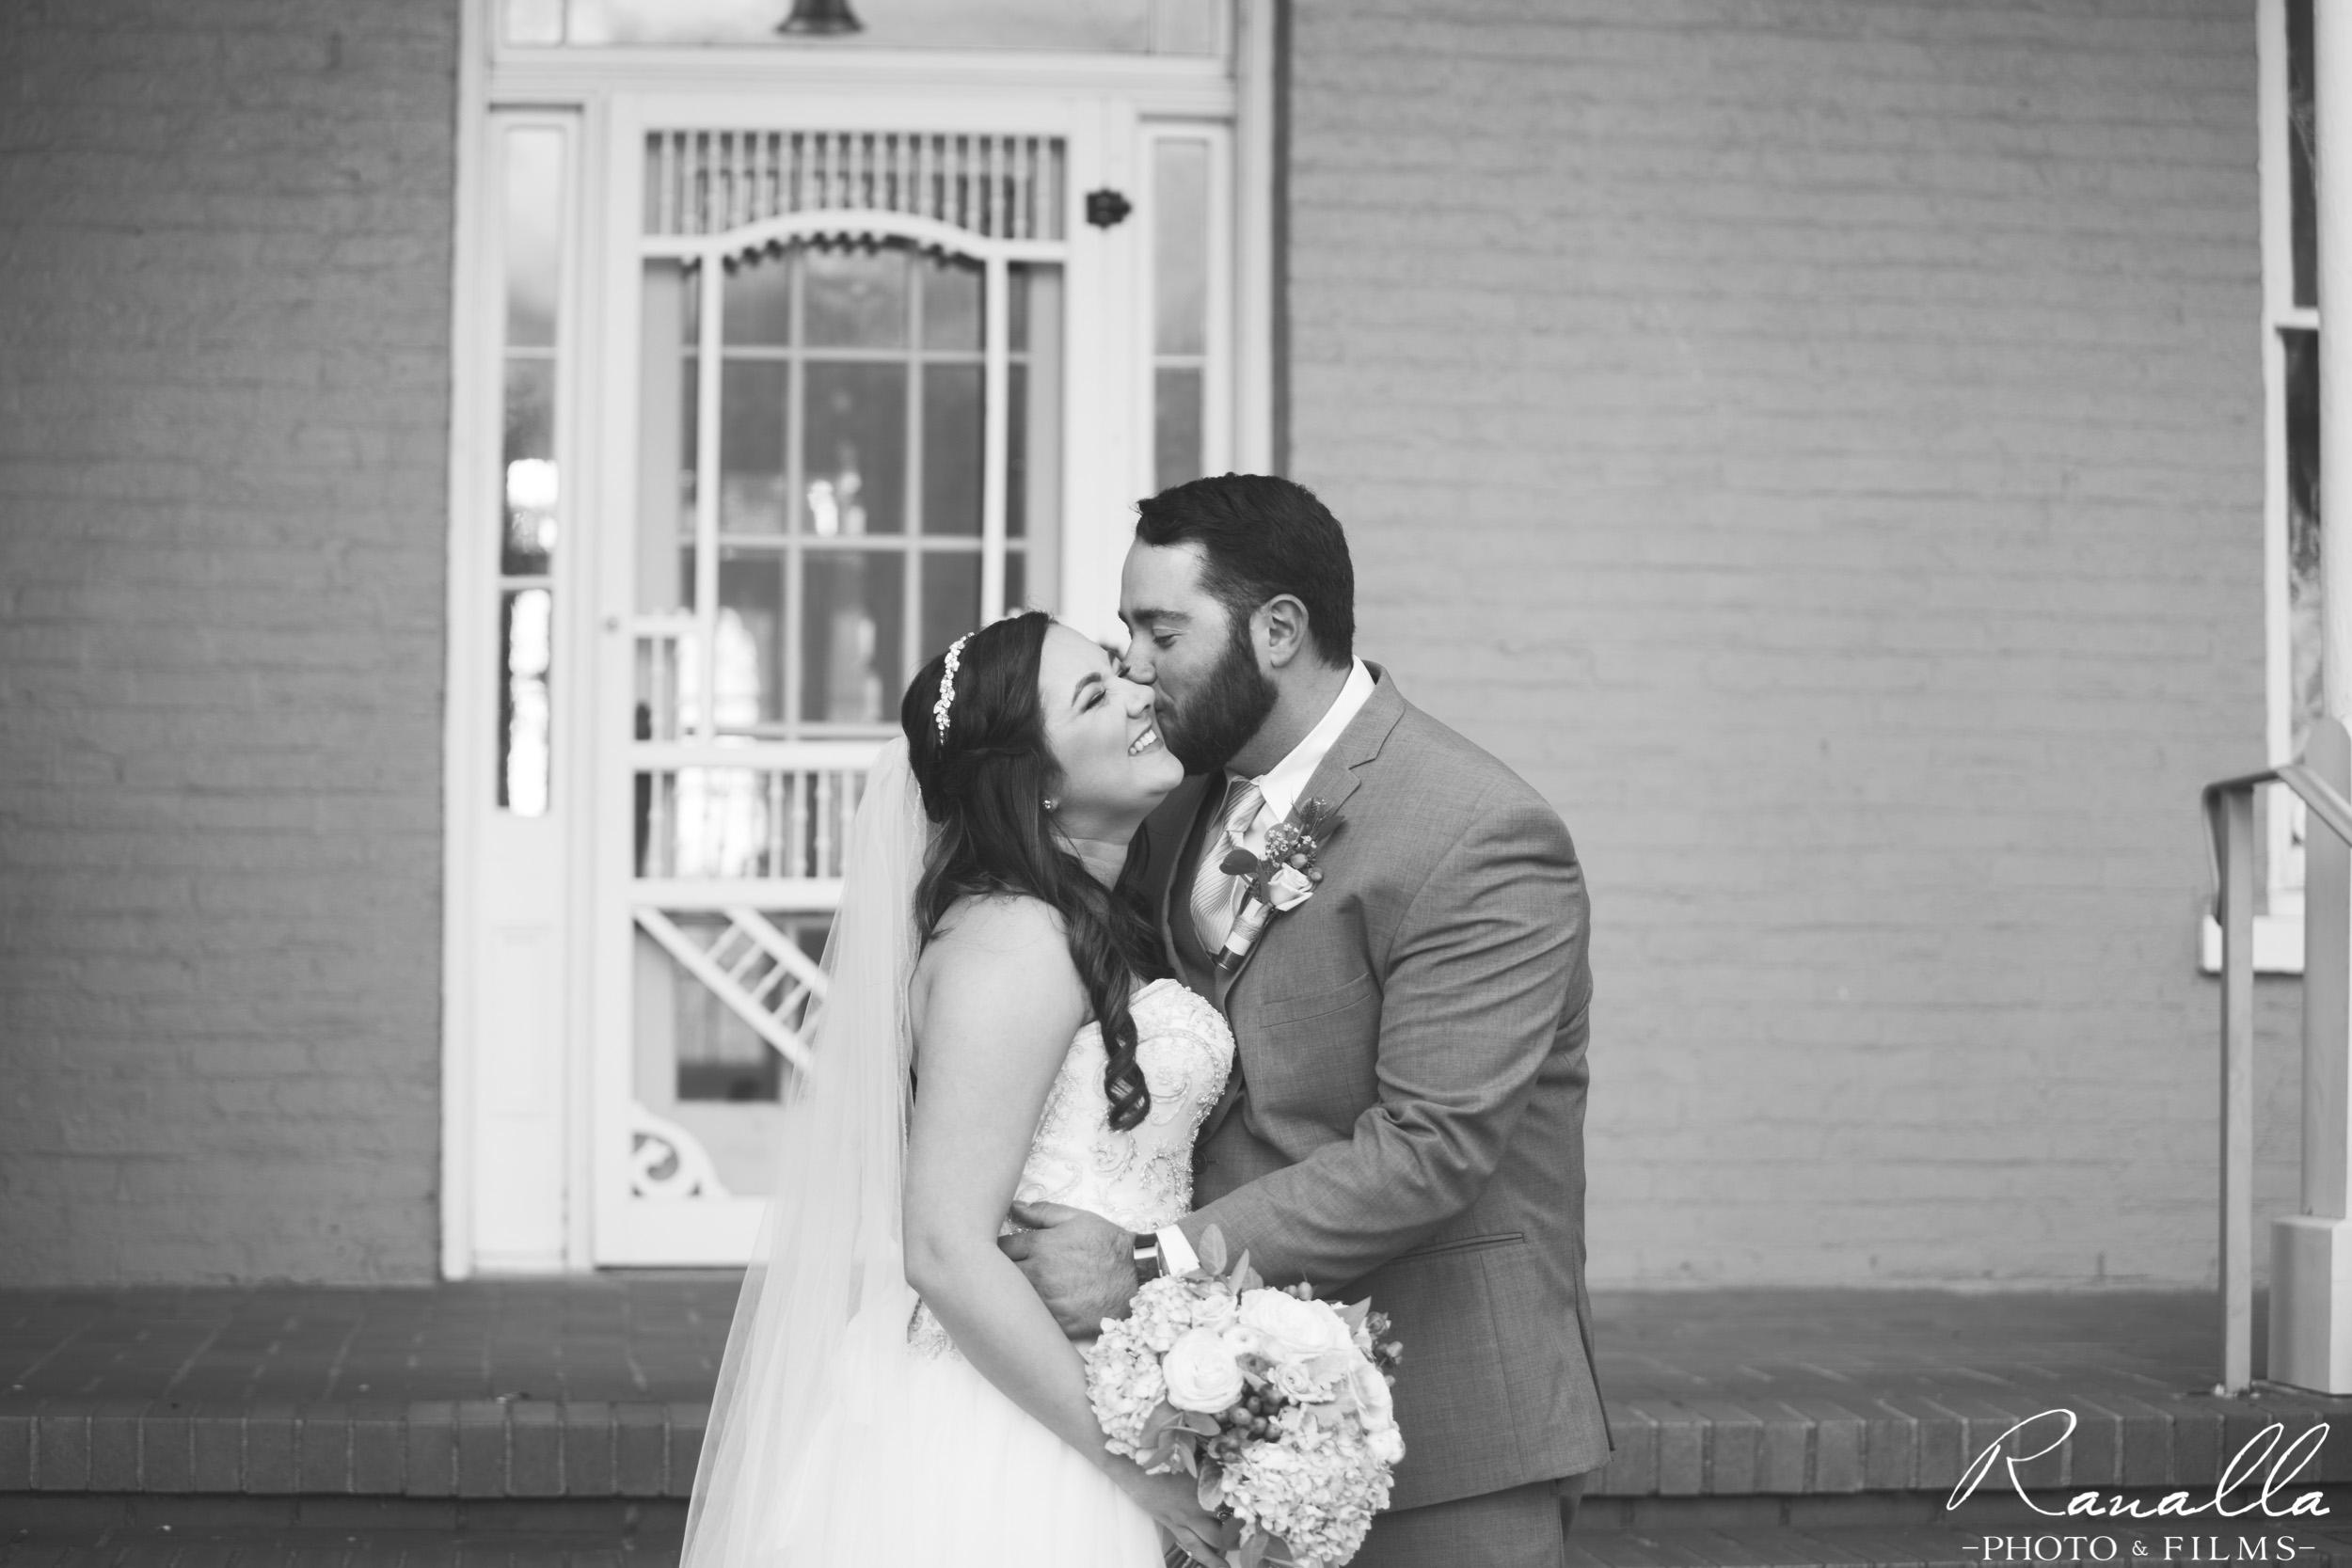 Chico Wedding Photography- Bride & Groom Kiss- Patrick Ranch Wedding Photos- Ranalla Photo & Films